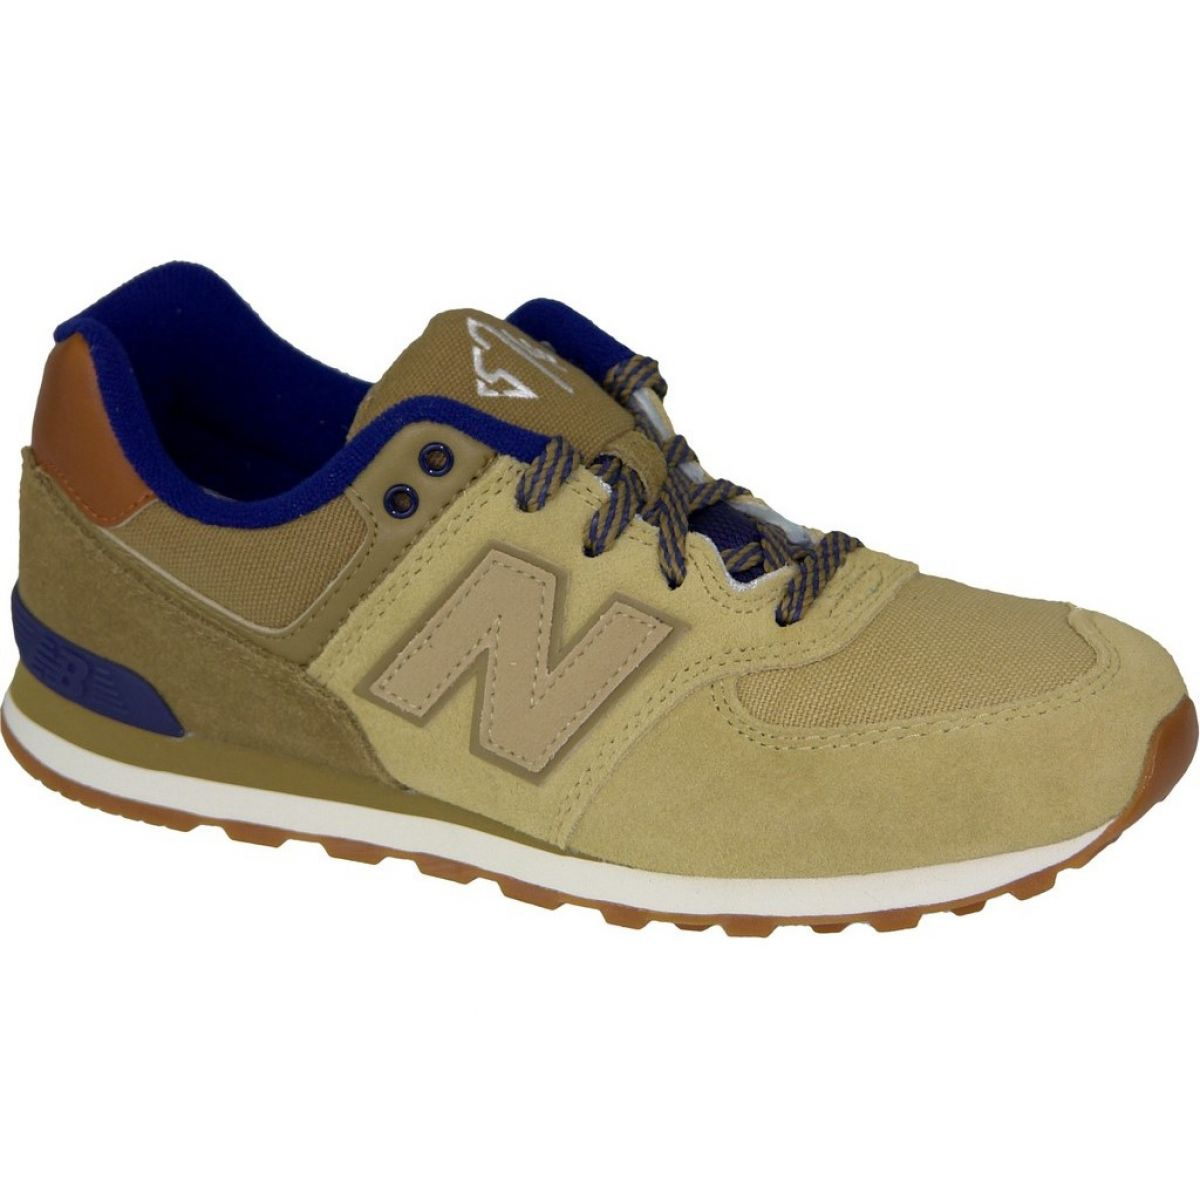 cheaper 5b4a4 56085 Braun New Balance Schuhe W KL574NMG